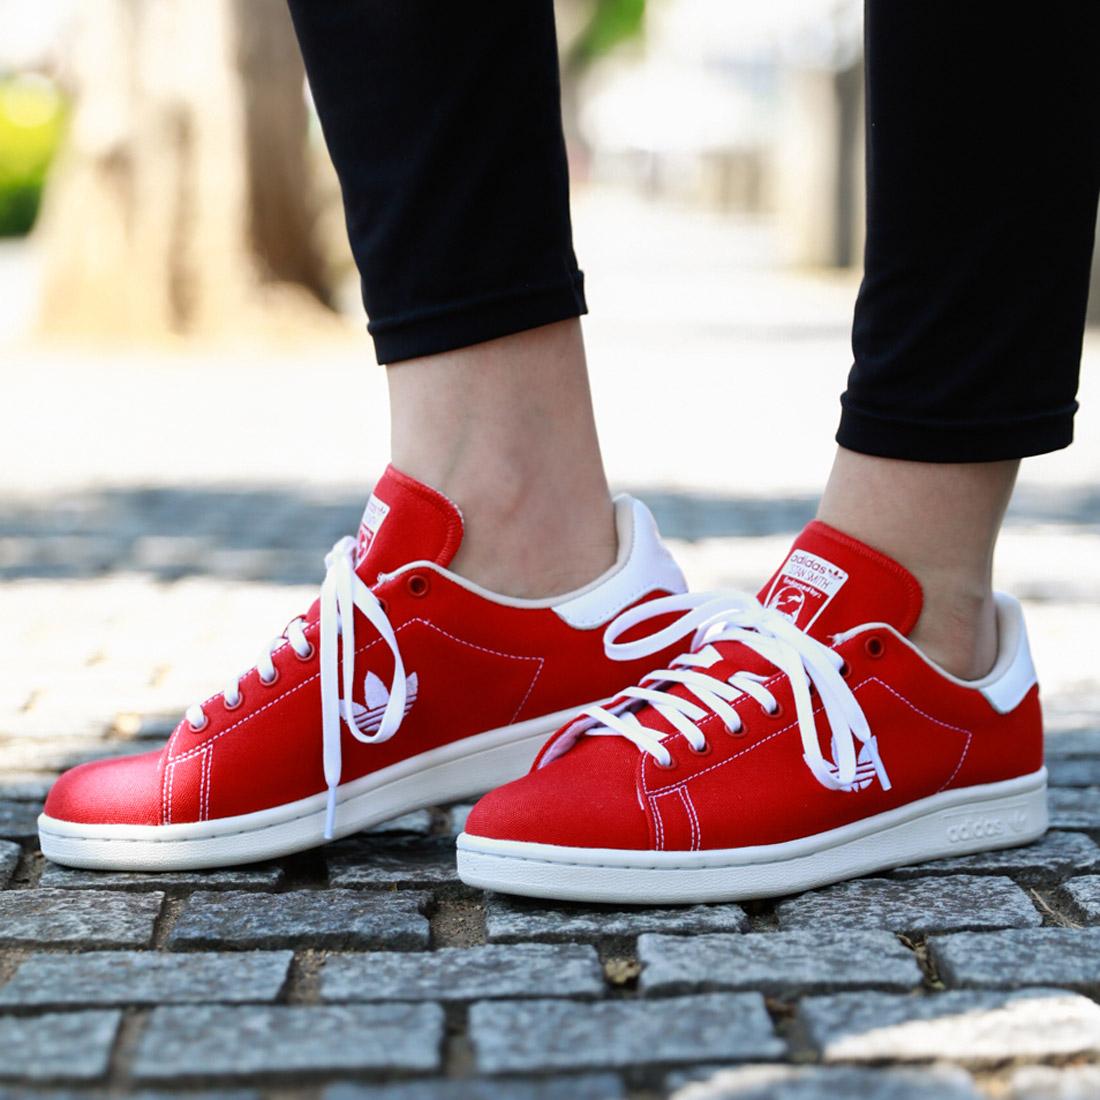 adidas Originals Stan Smith(アディダス オリジナルス スタンスミス)Scarlet/Running White/Clear Brown【メンズ レディース スニーカー】18FW-I